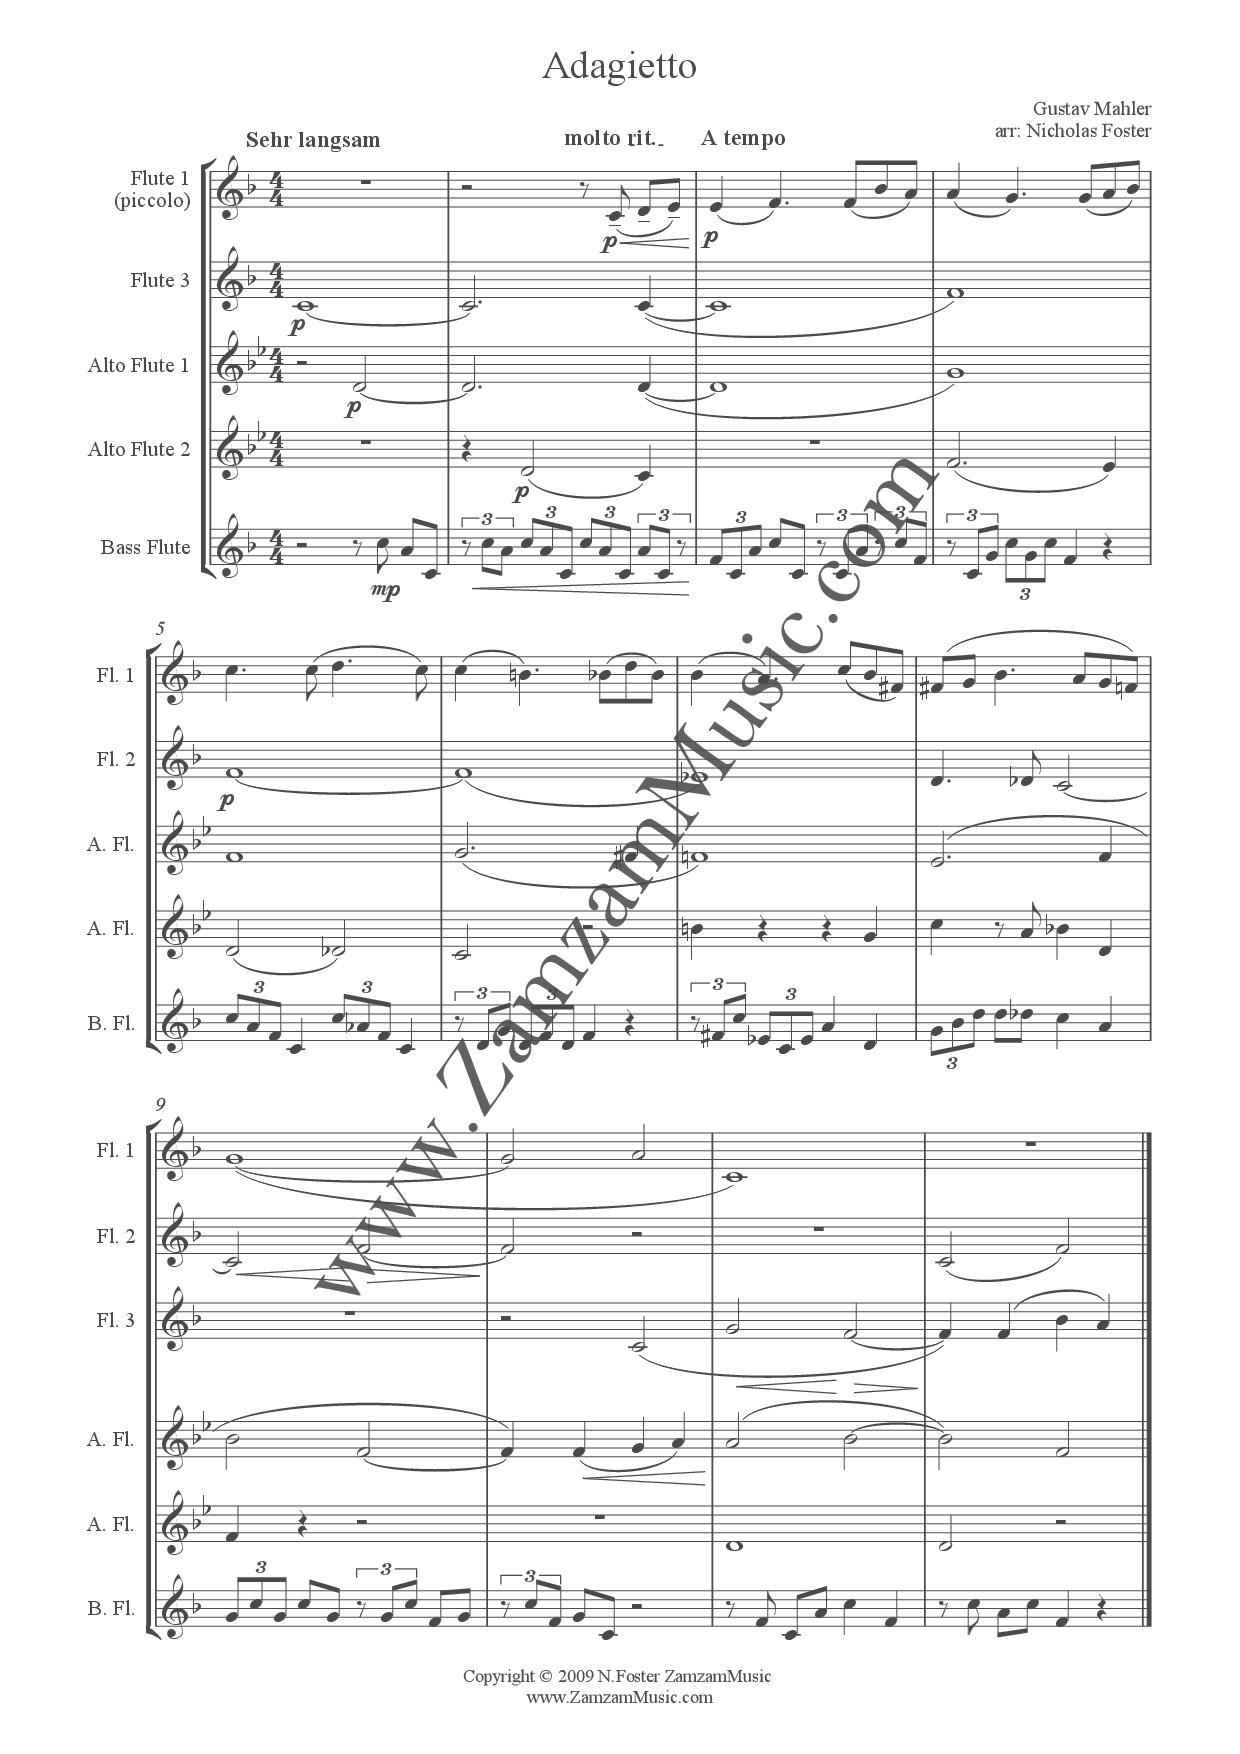 5Th Symphony mahler - adagietto from 5th symphony for flute choir. - zamzam music